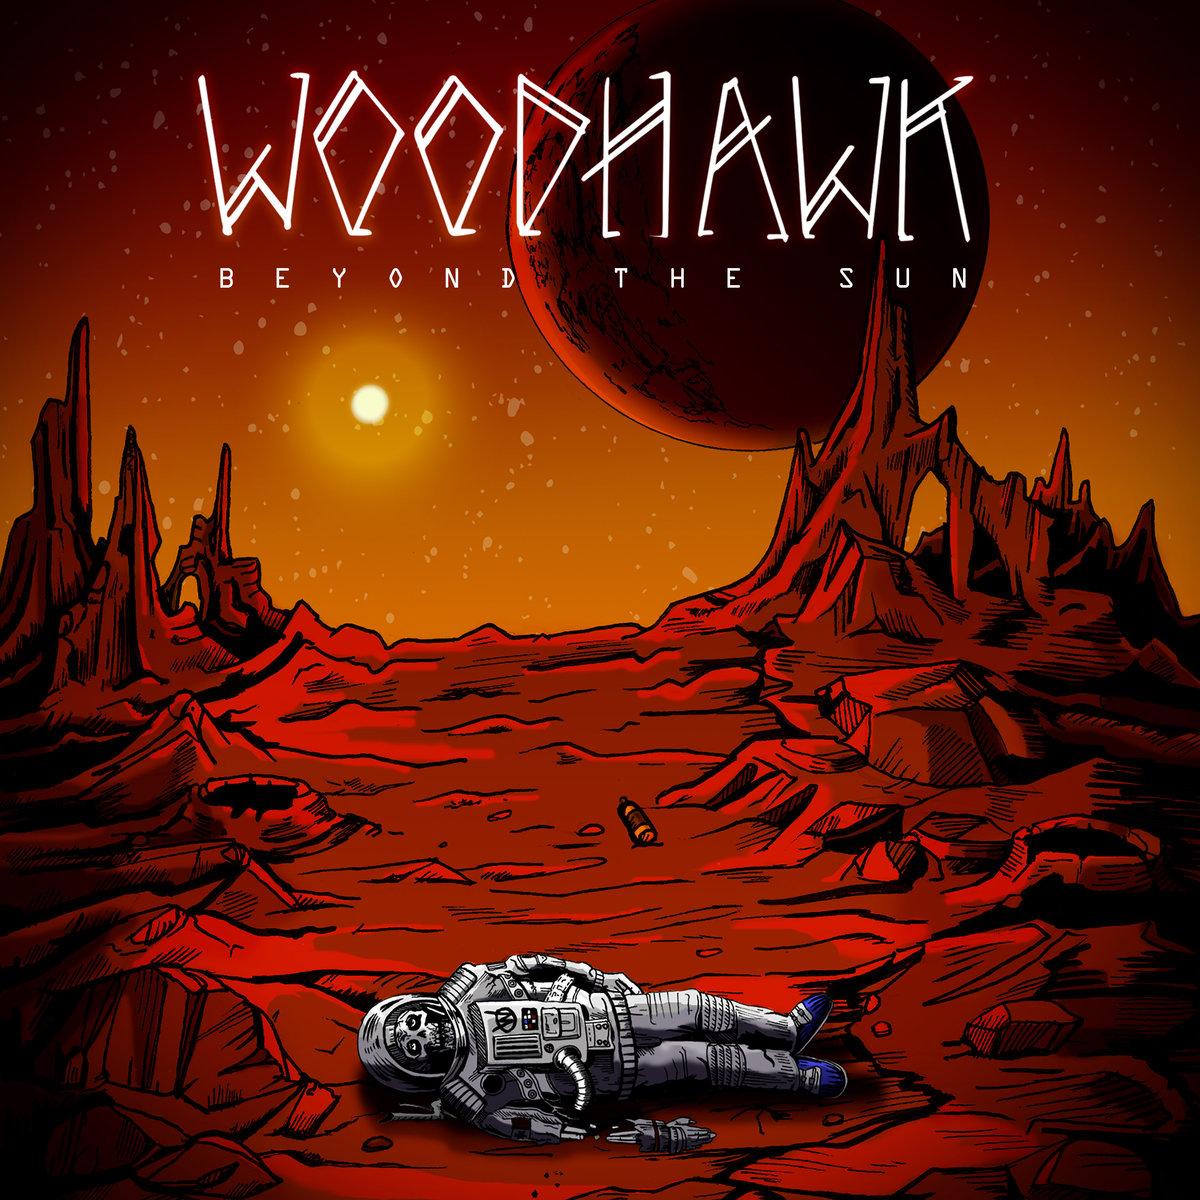 Introducing WOODHAWK